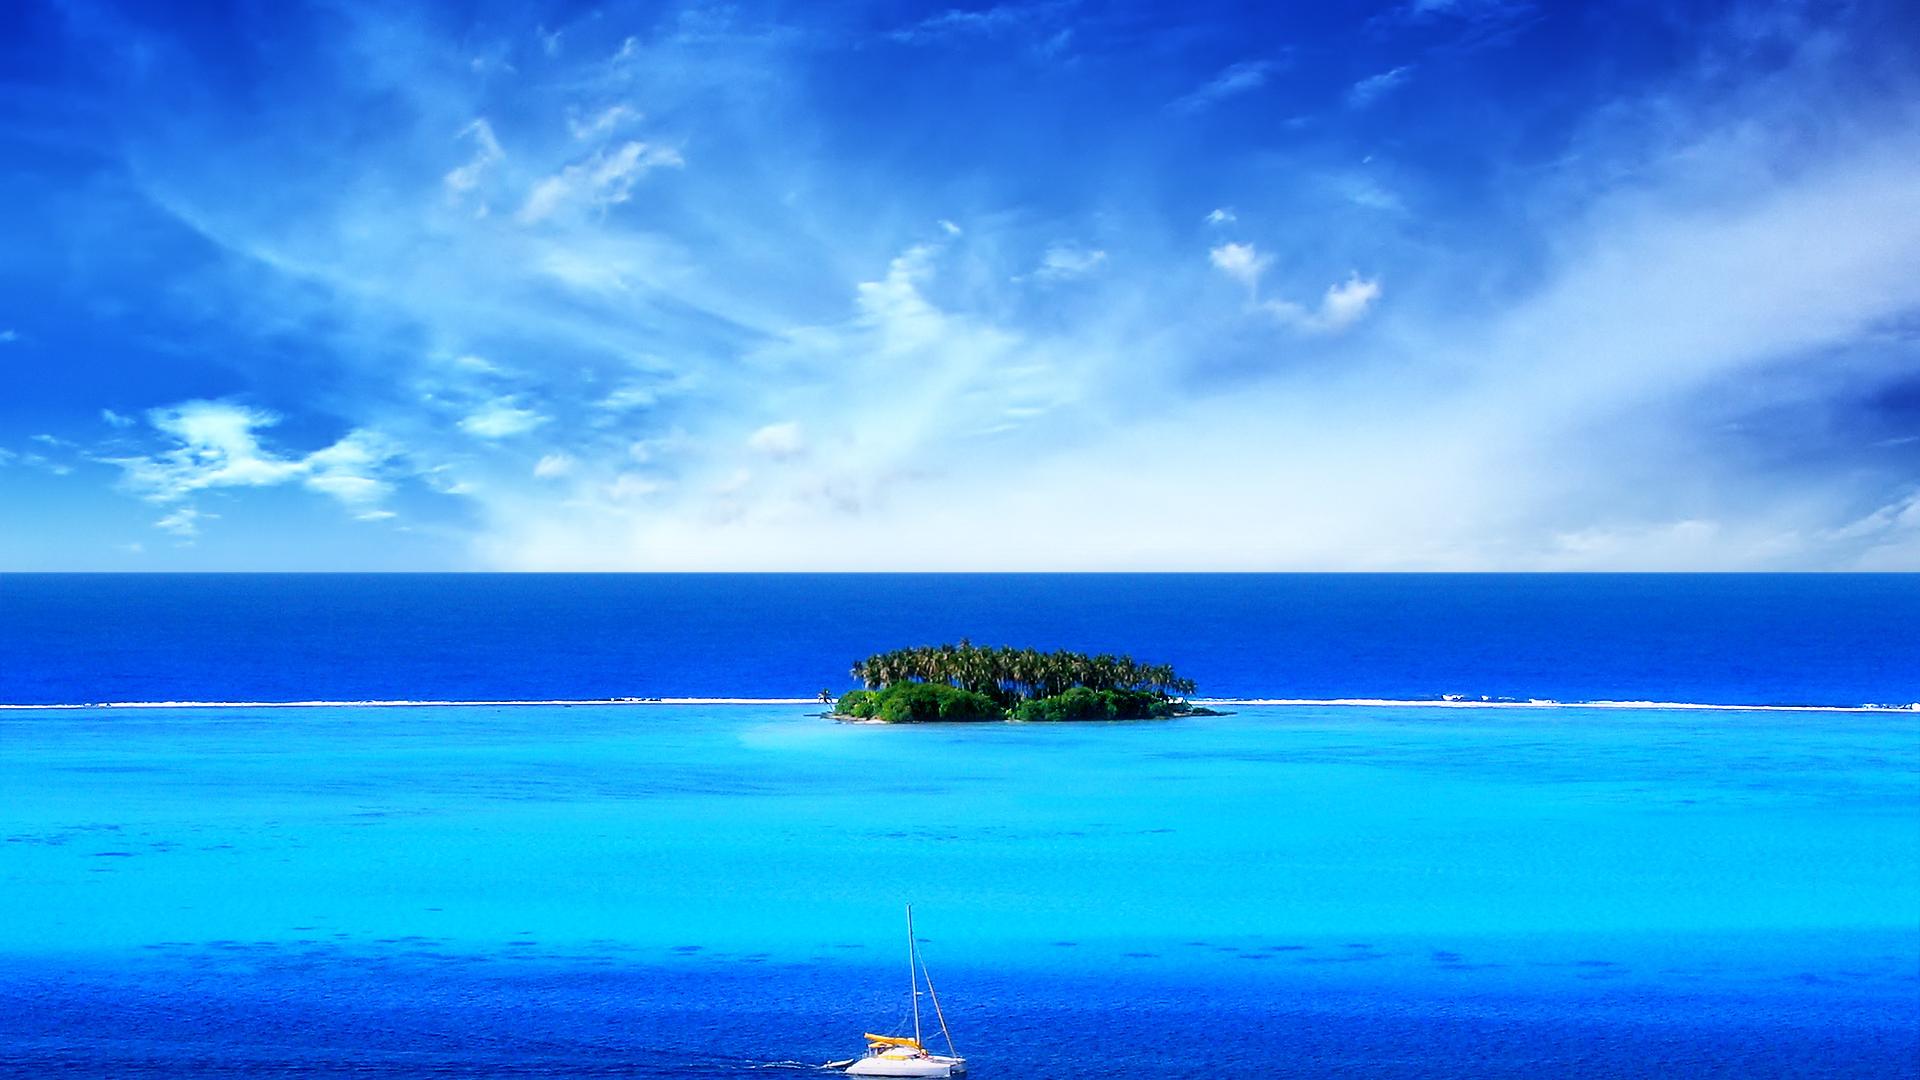 Perfect Island Wallpaper